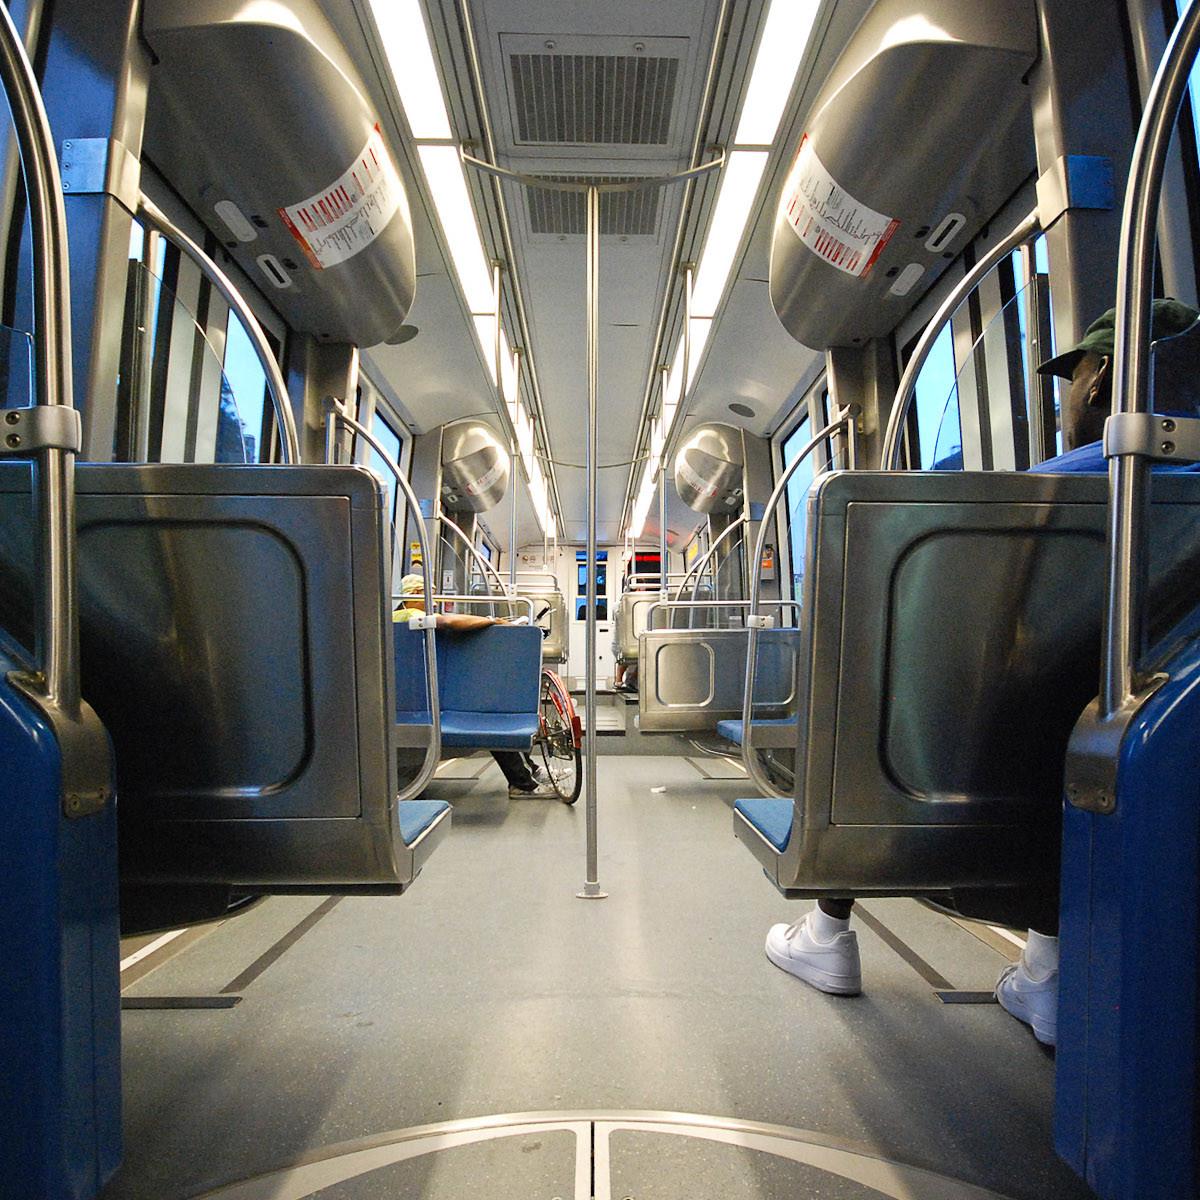 News_Metro university line_Jan 10